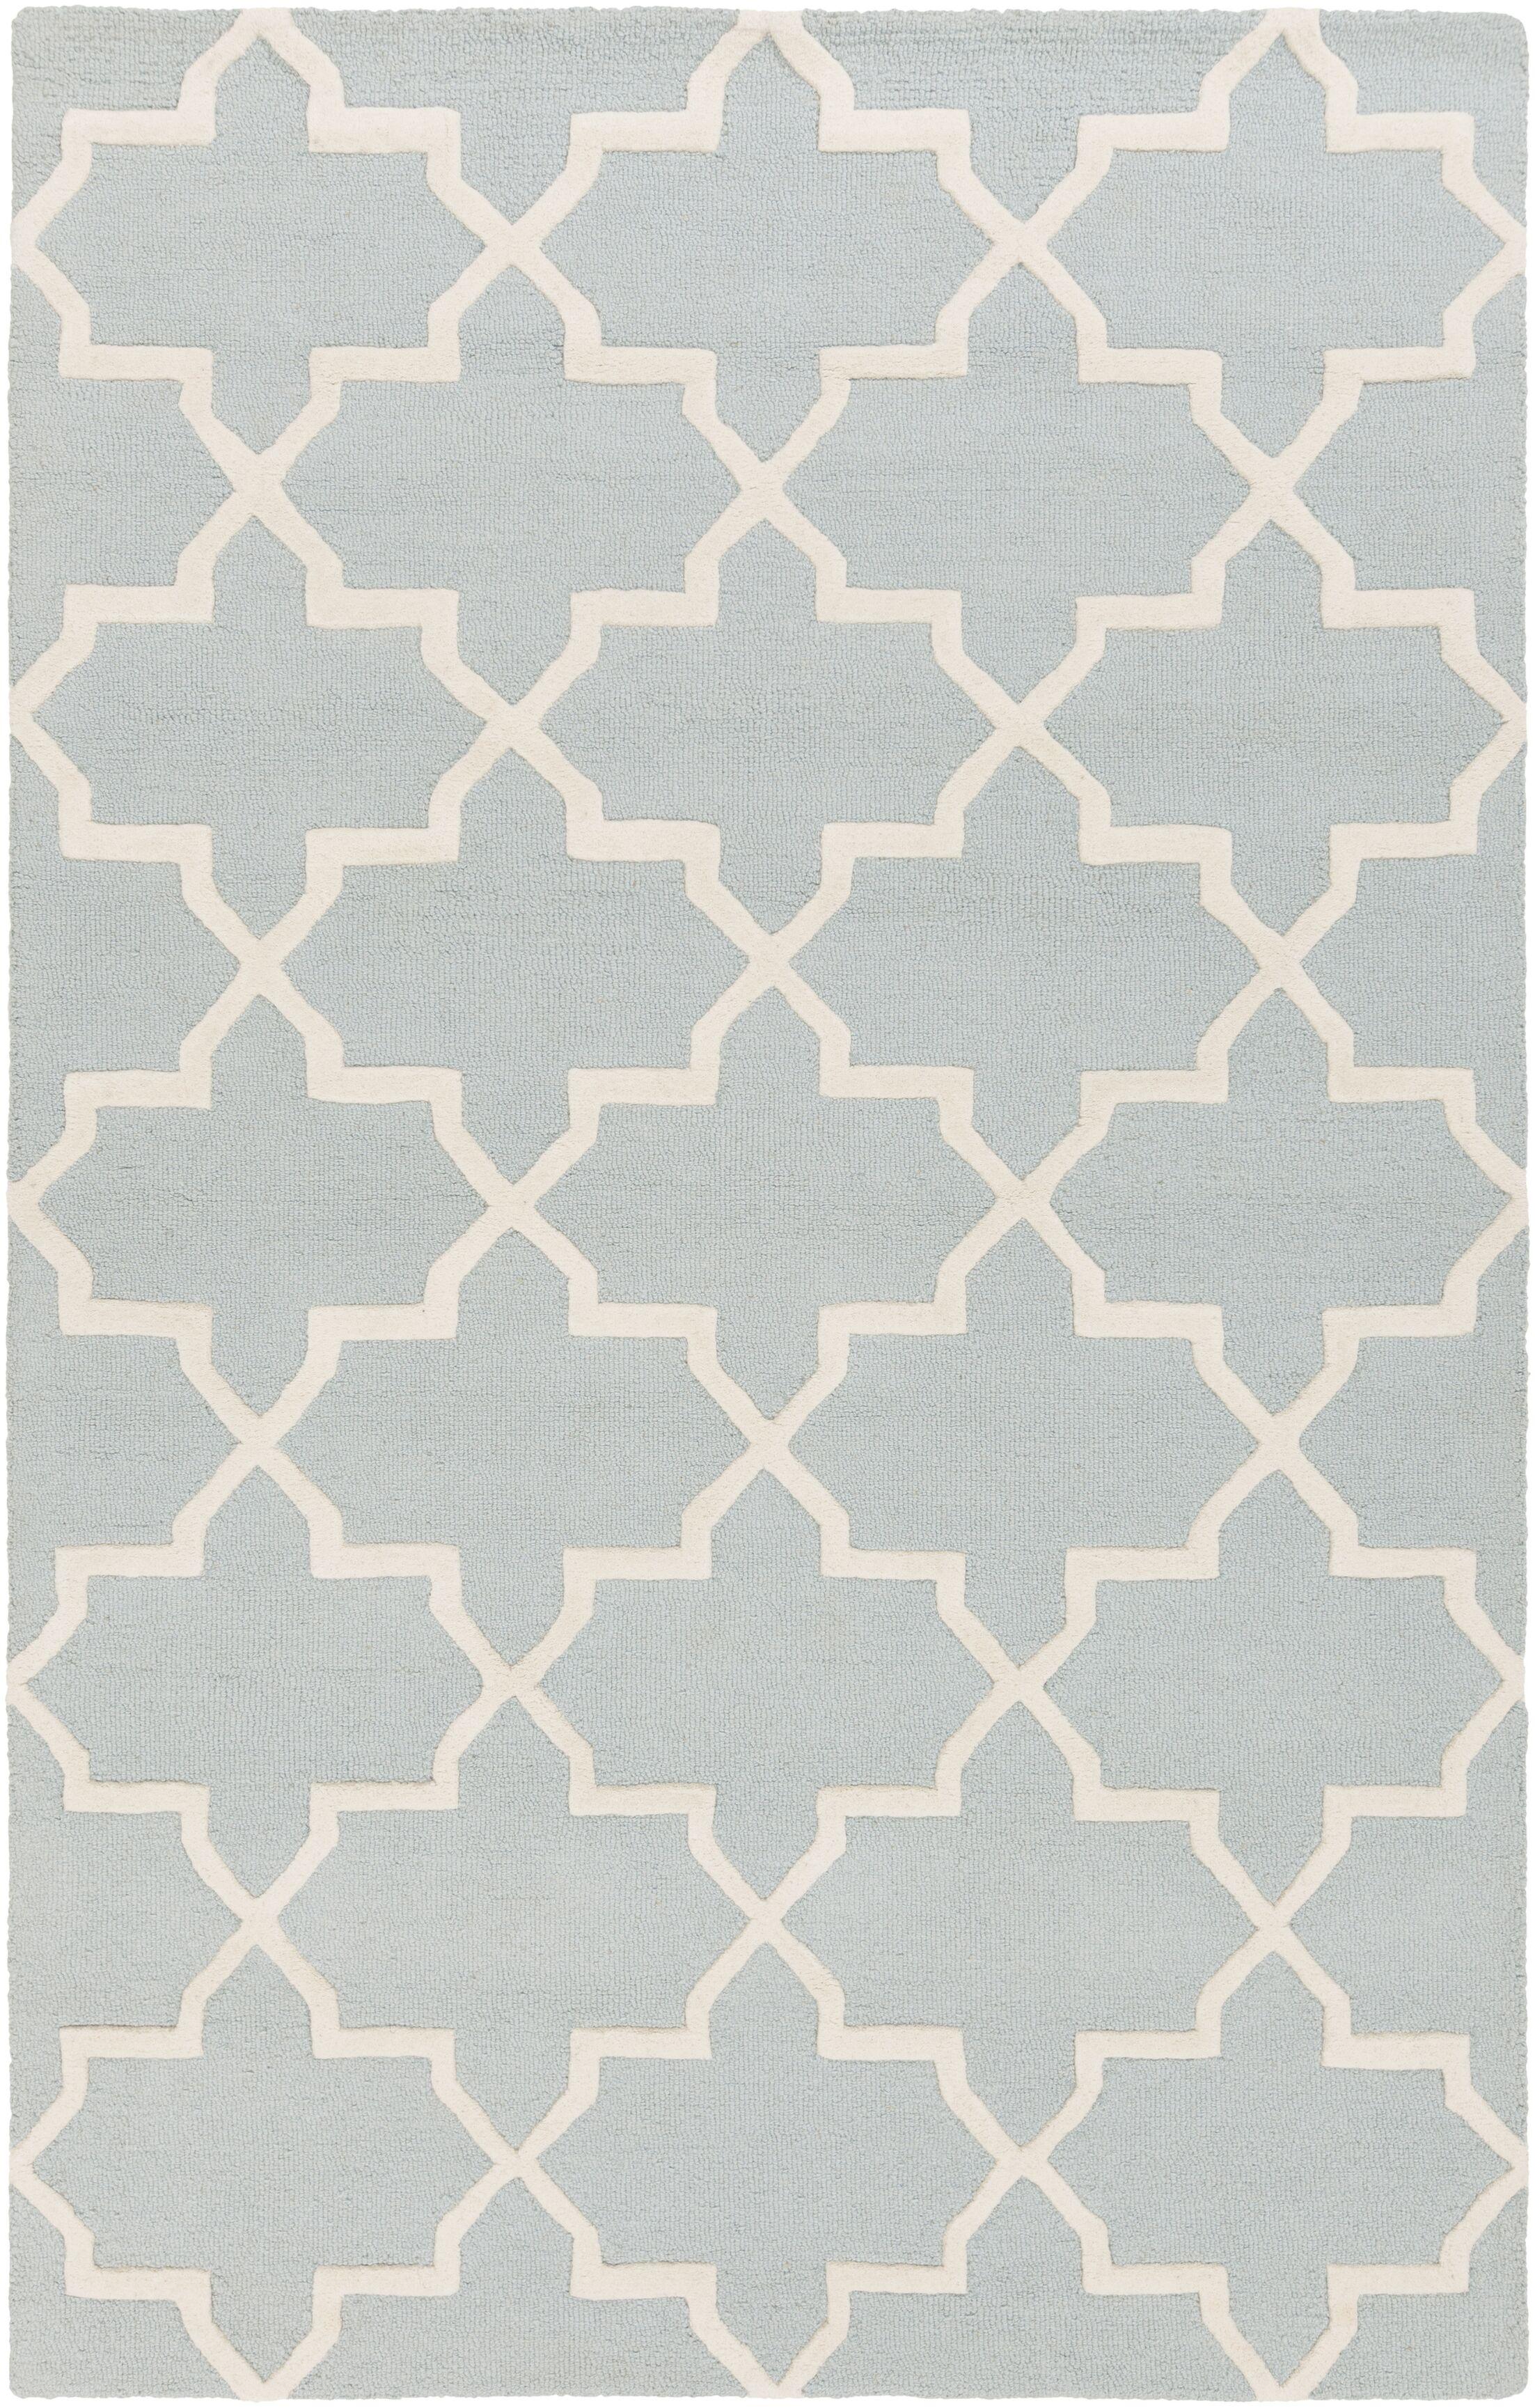 Blaisdell Blue Geometric Keely Area Rug Rug Size: Rectangle 5' x 8'